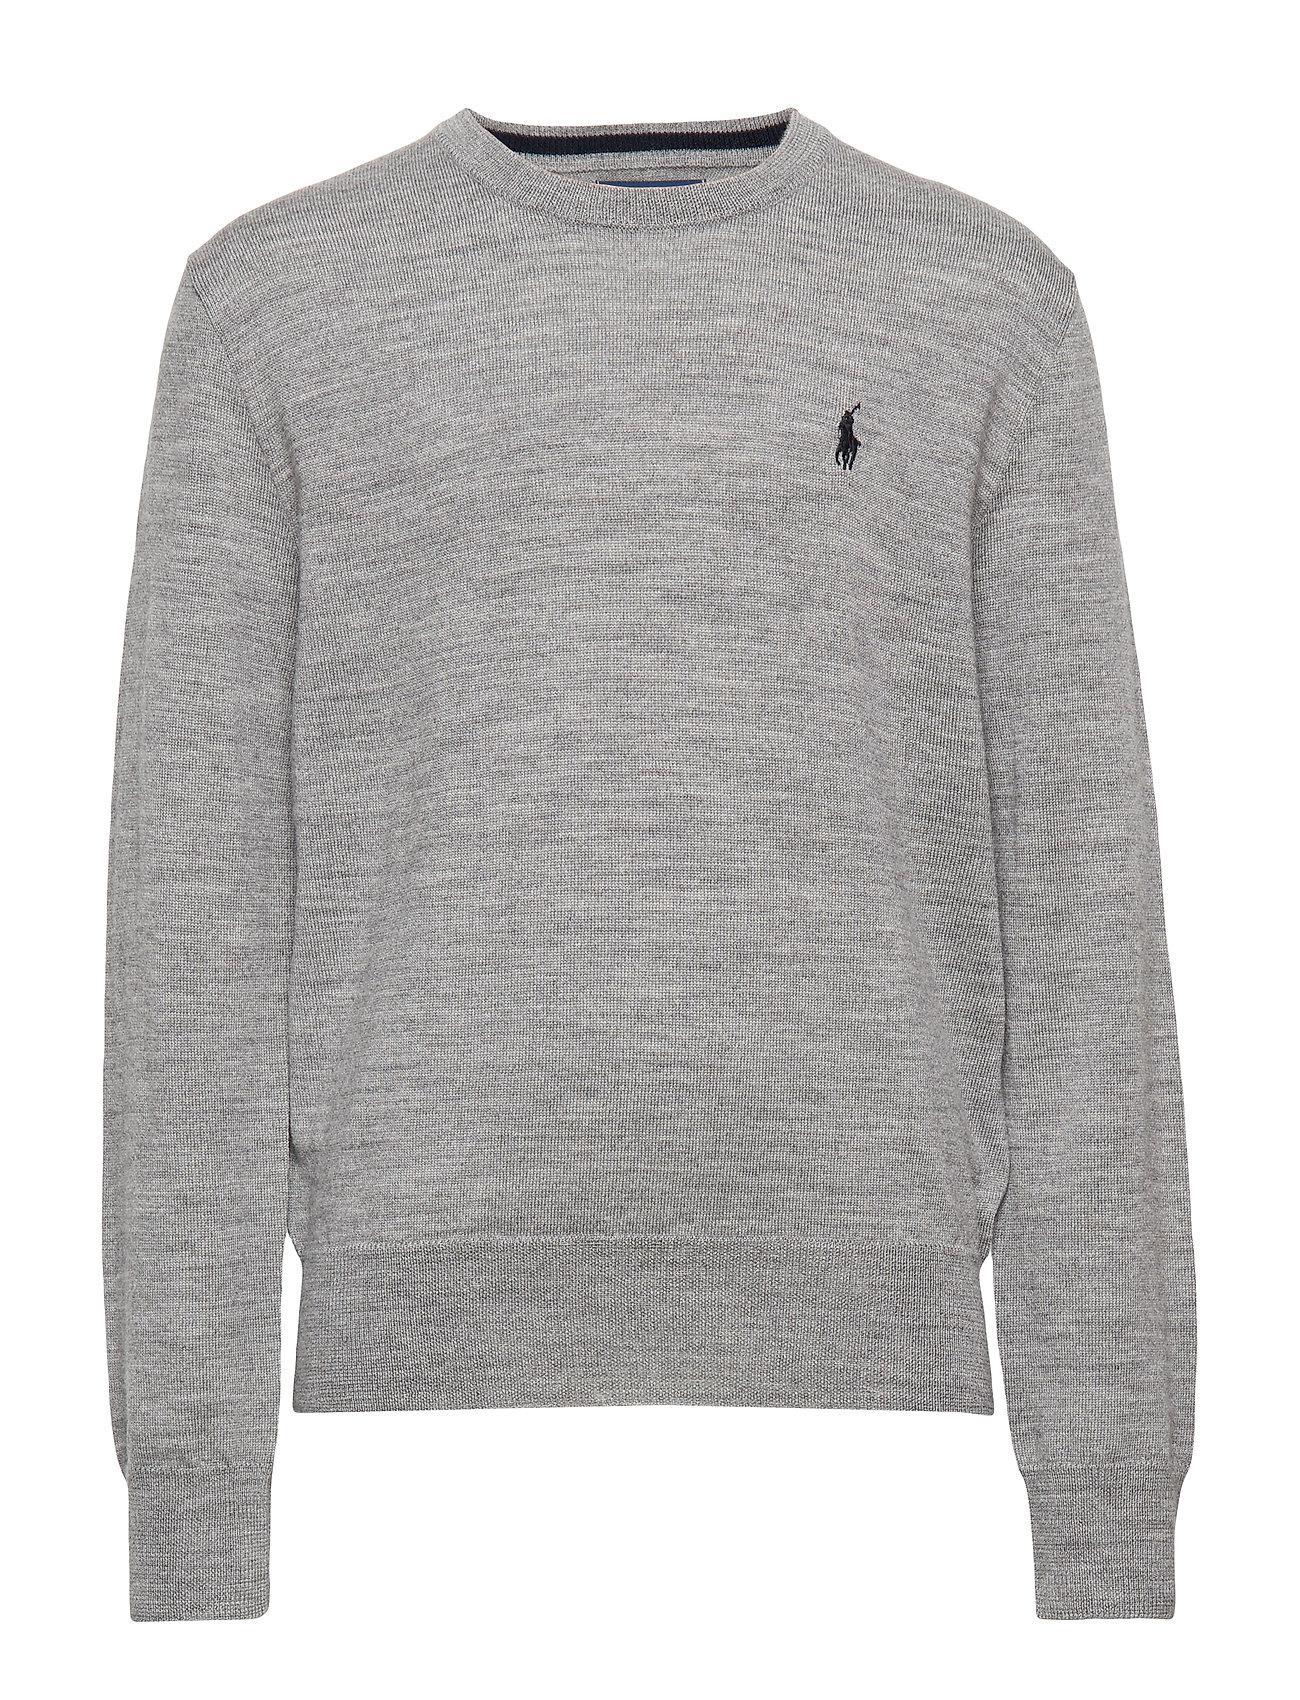 Ralph Lauren Kids Merino Wool Crewneck Sweater - DARK SPORT HEATHE